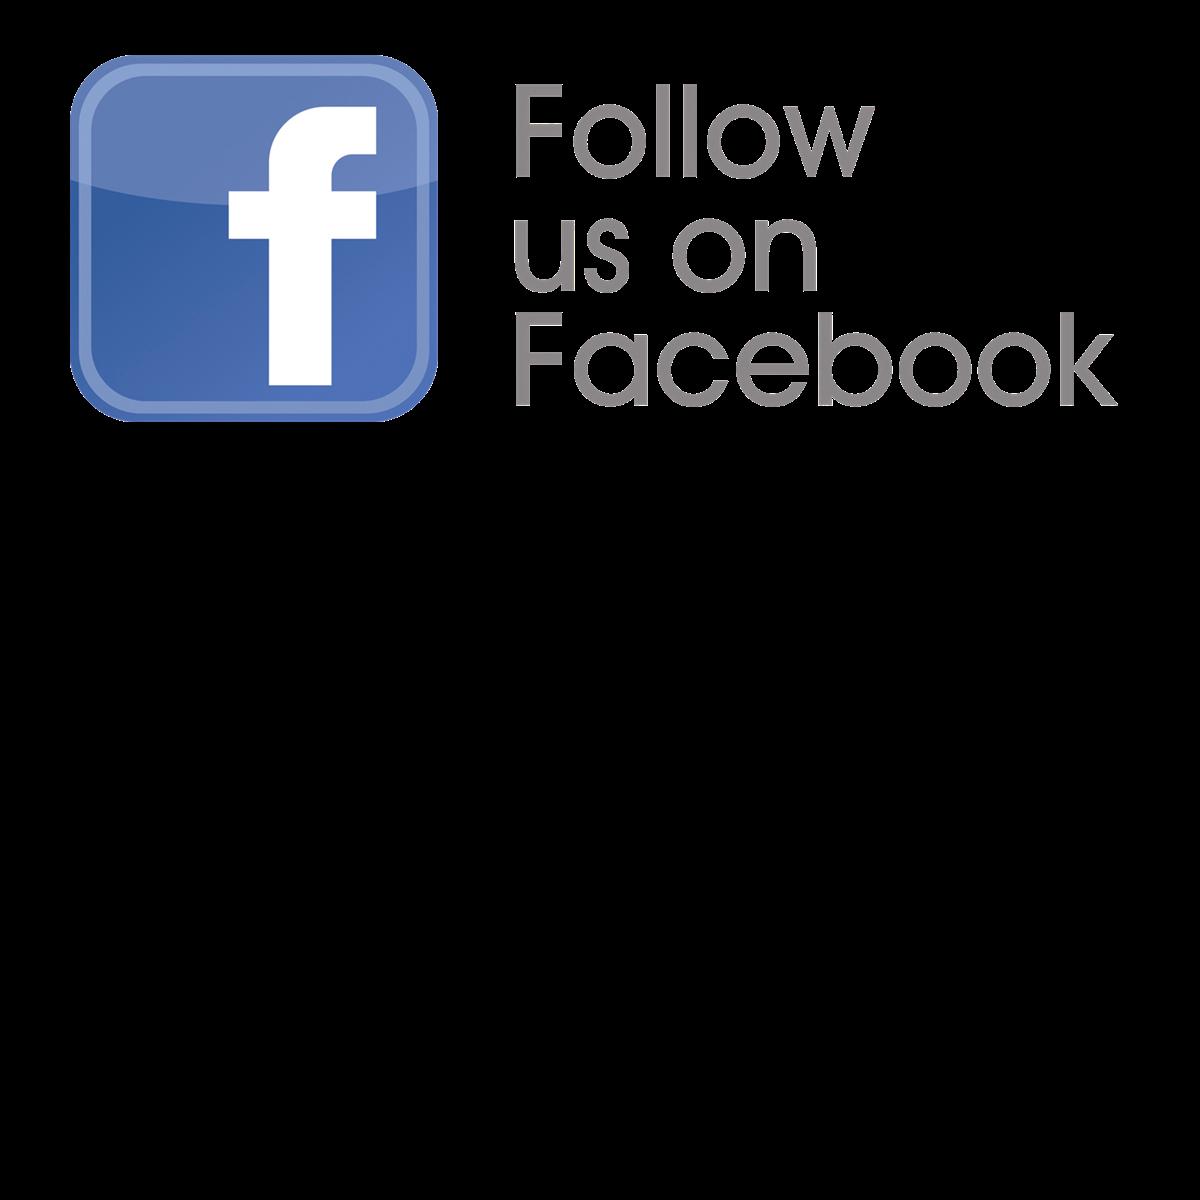 Follow Roberta Weissburg Leathers on Facebook